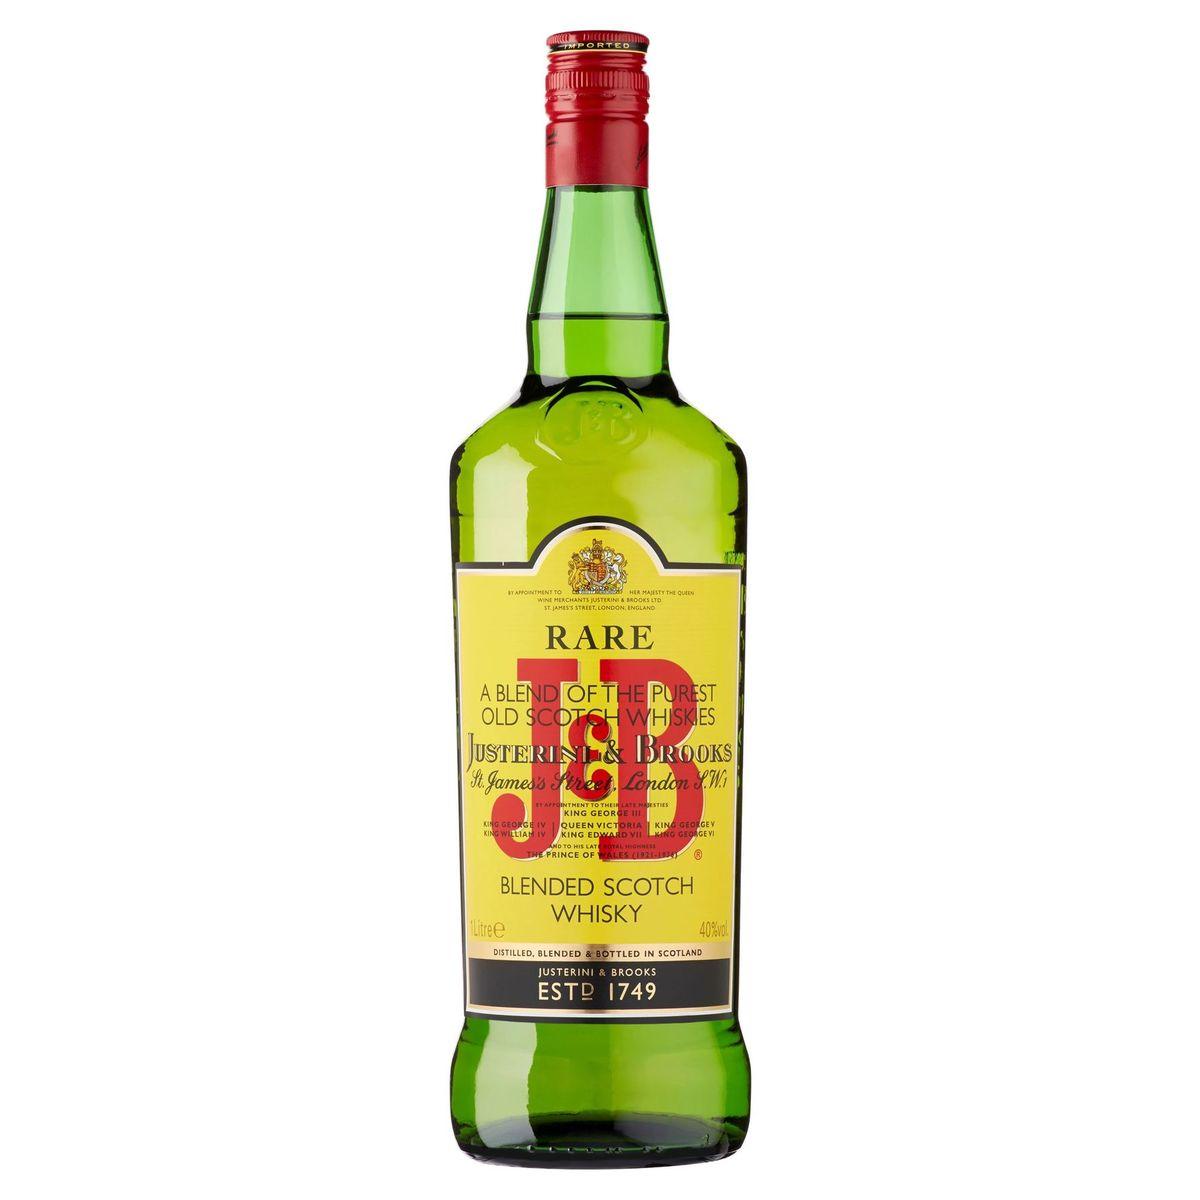 J&B Rare Blended Scotch Whisky 1 L